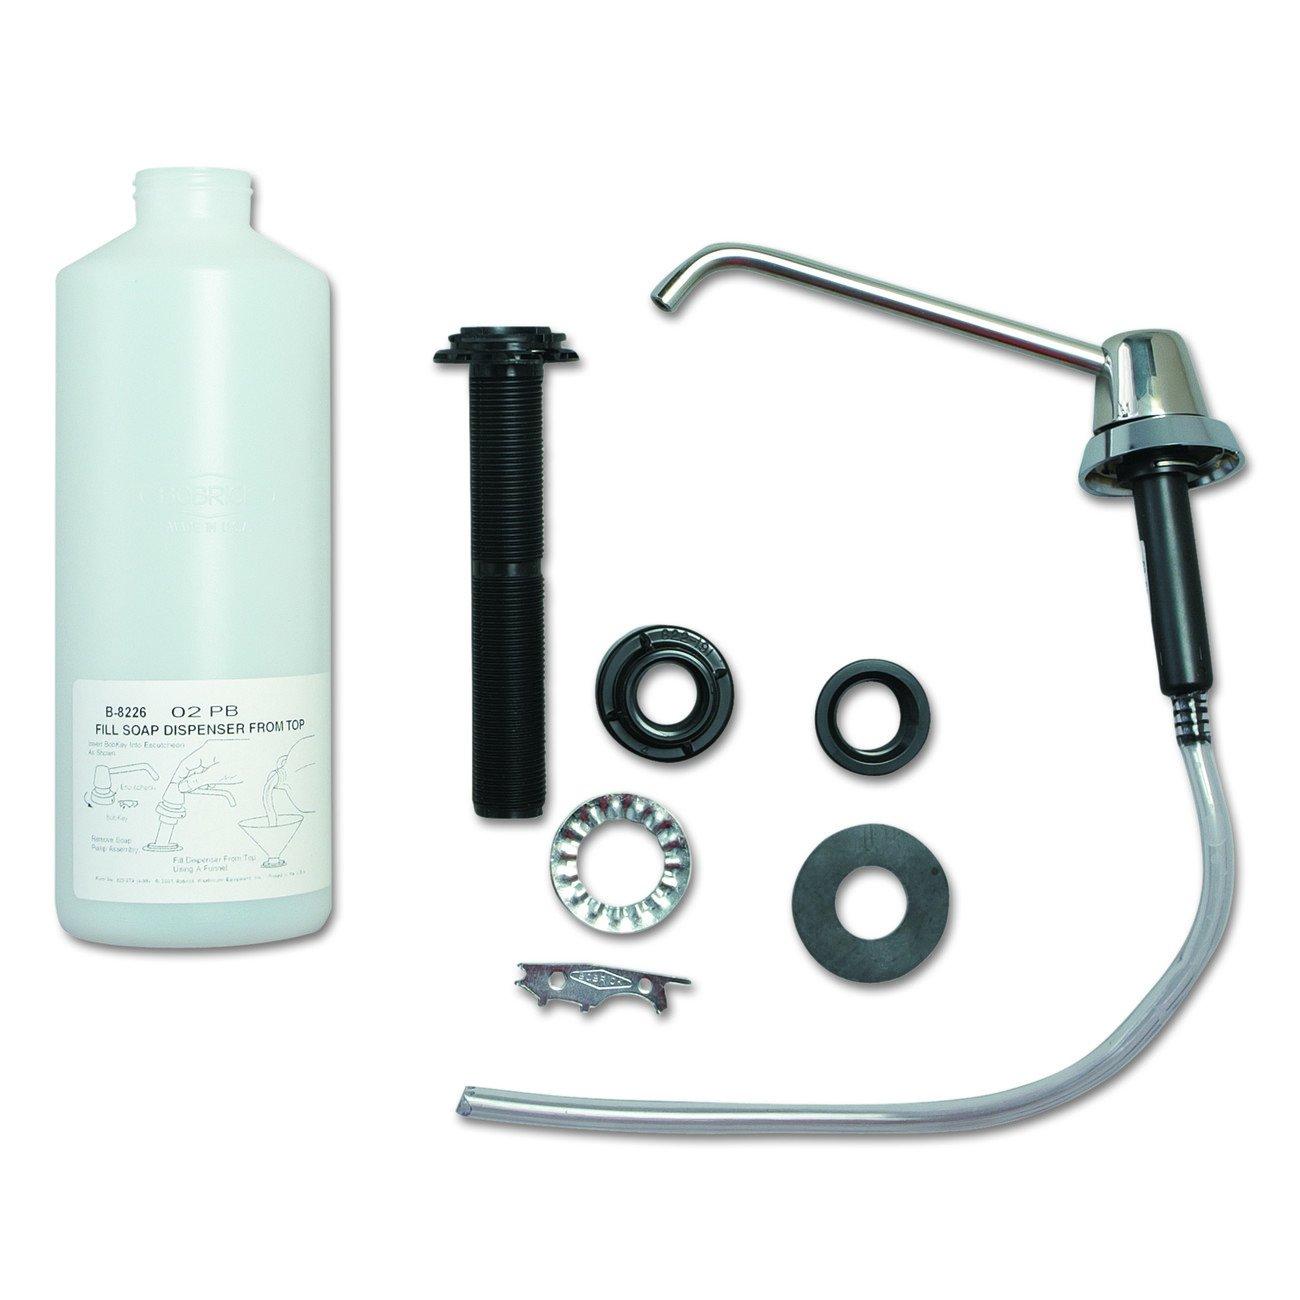 "Bobrick B-8226 34 fl oz Capacity, 4"" Thickness Lavatory-Mounted Soap Dispenser"